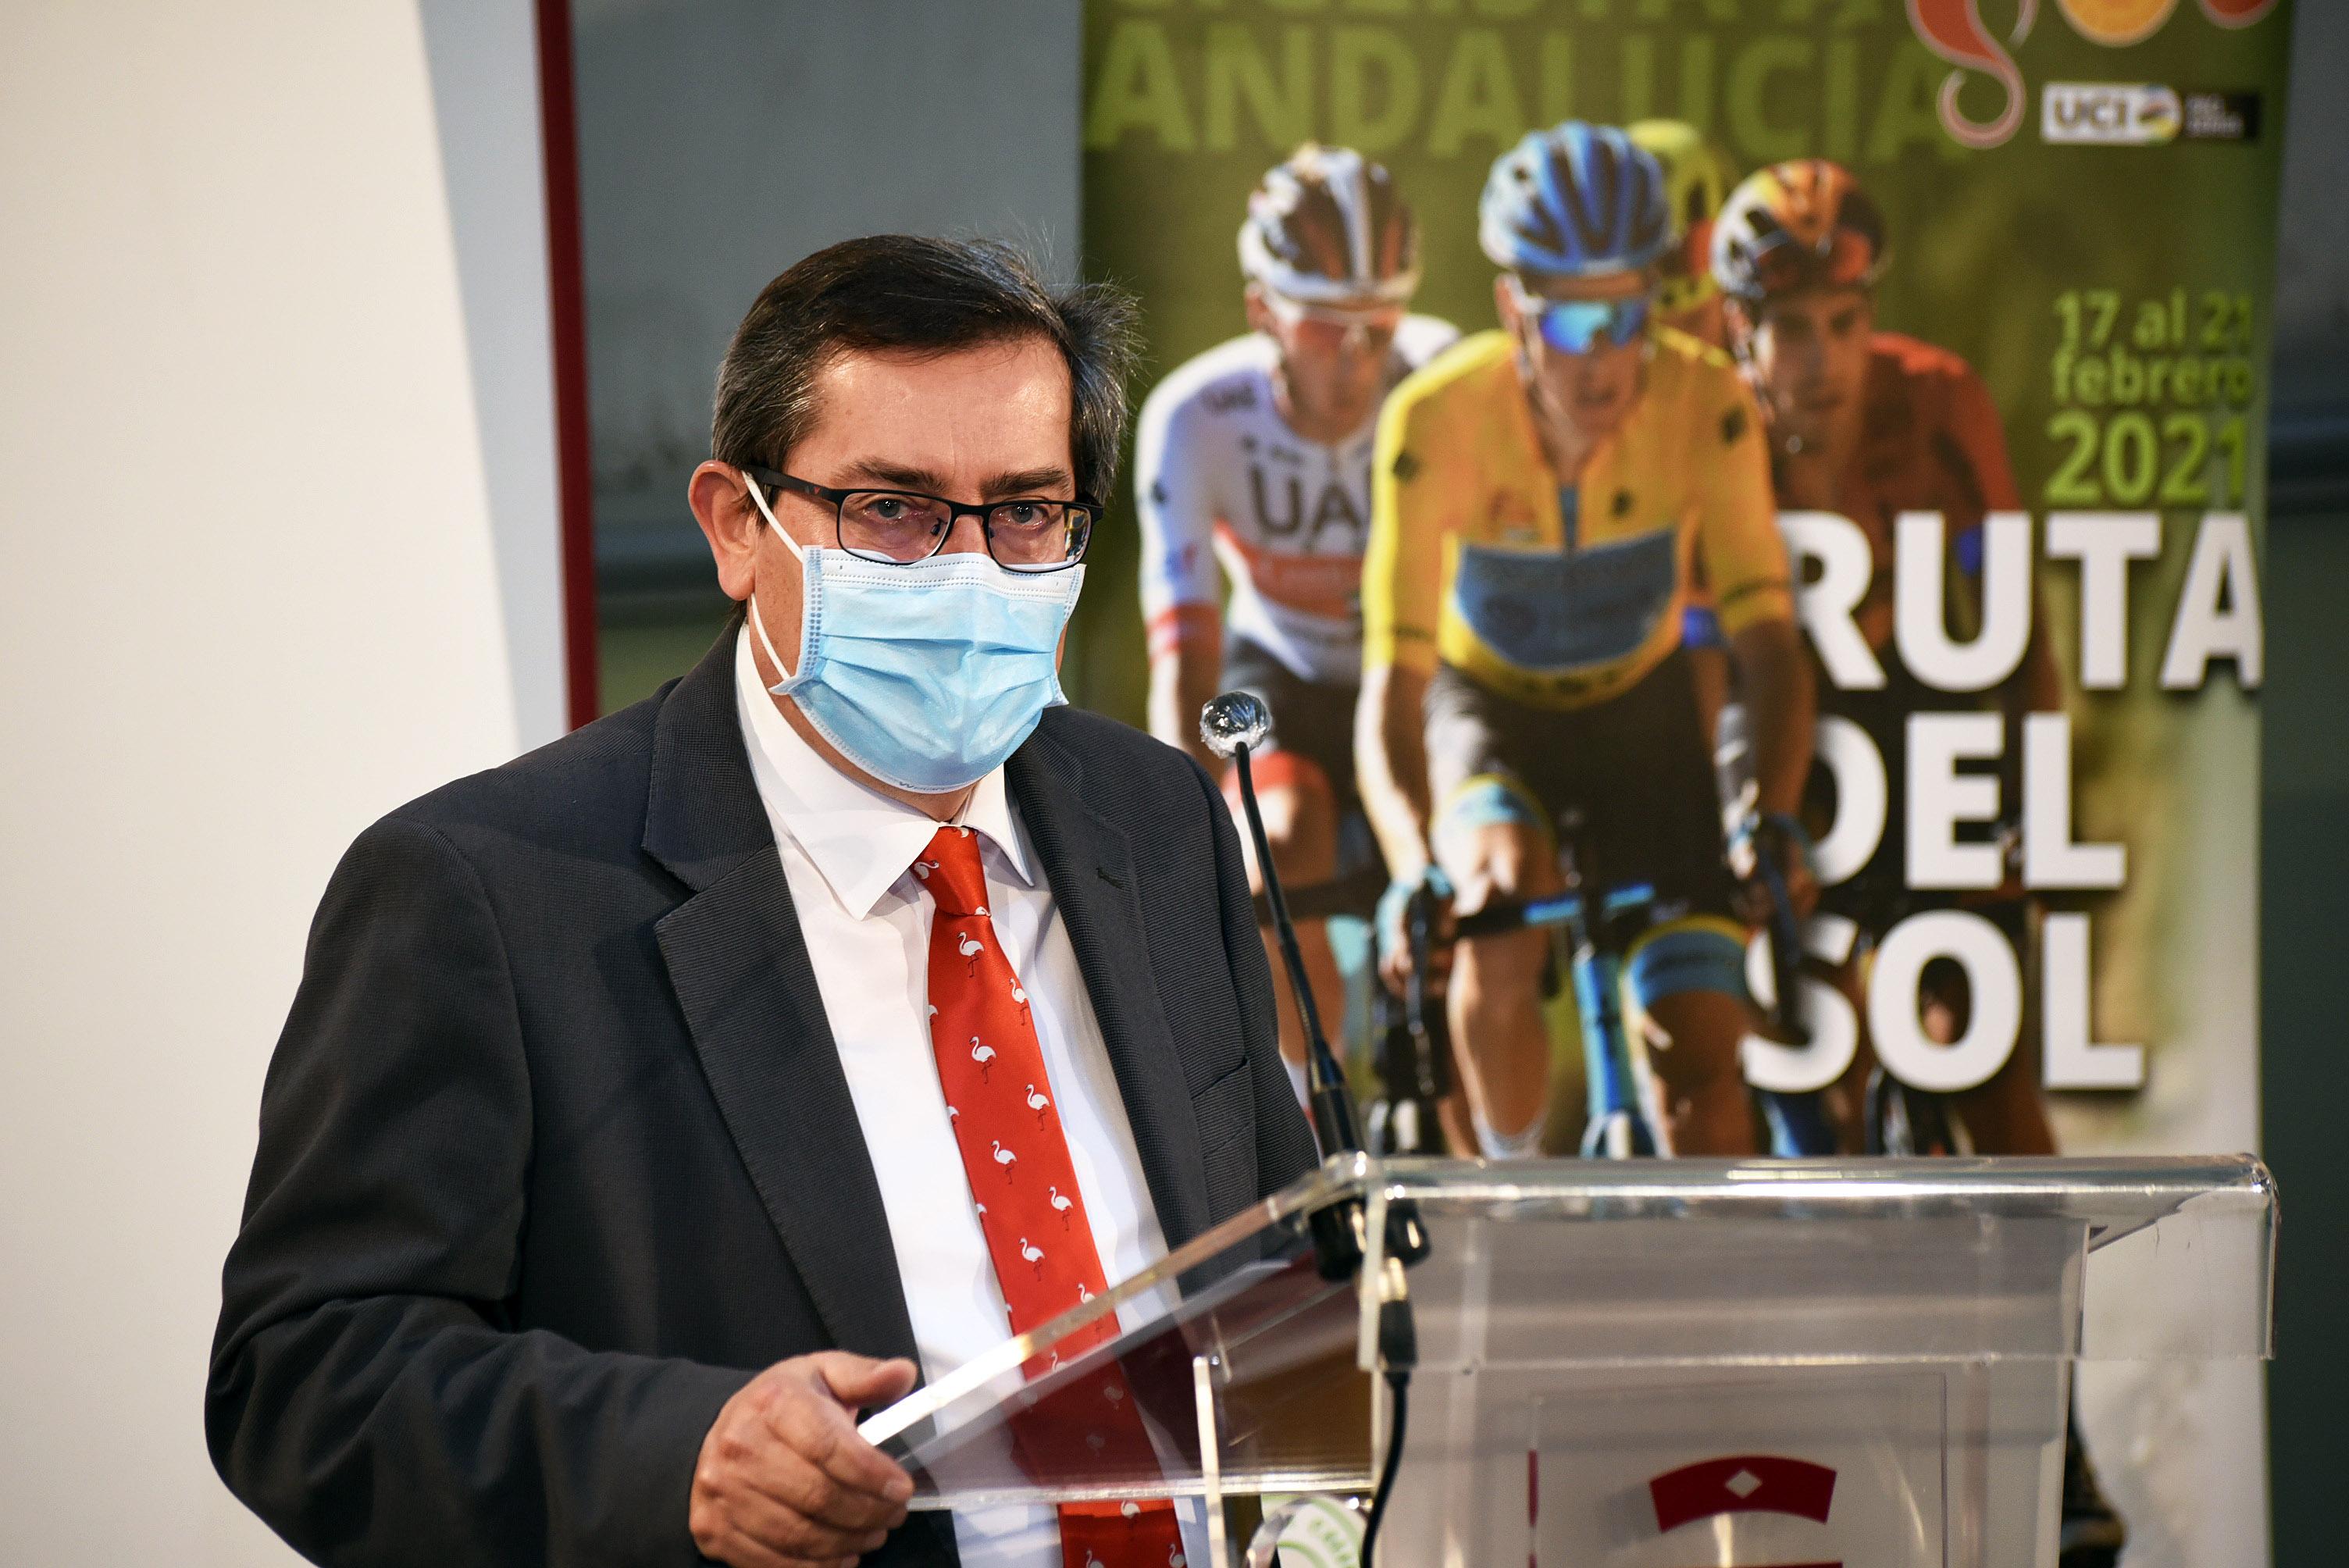 Dos etapas de la Vuelta Ciclista a Andalucía tendrán protagonismo de la provincia